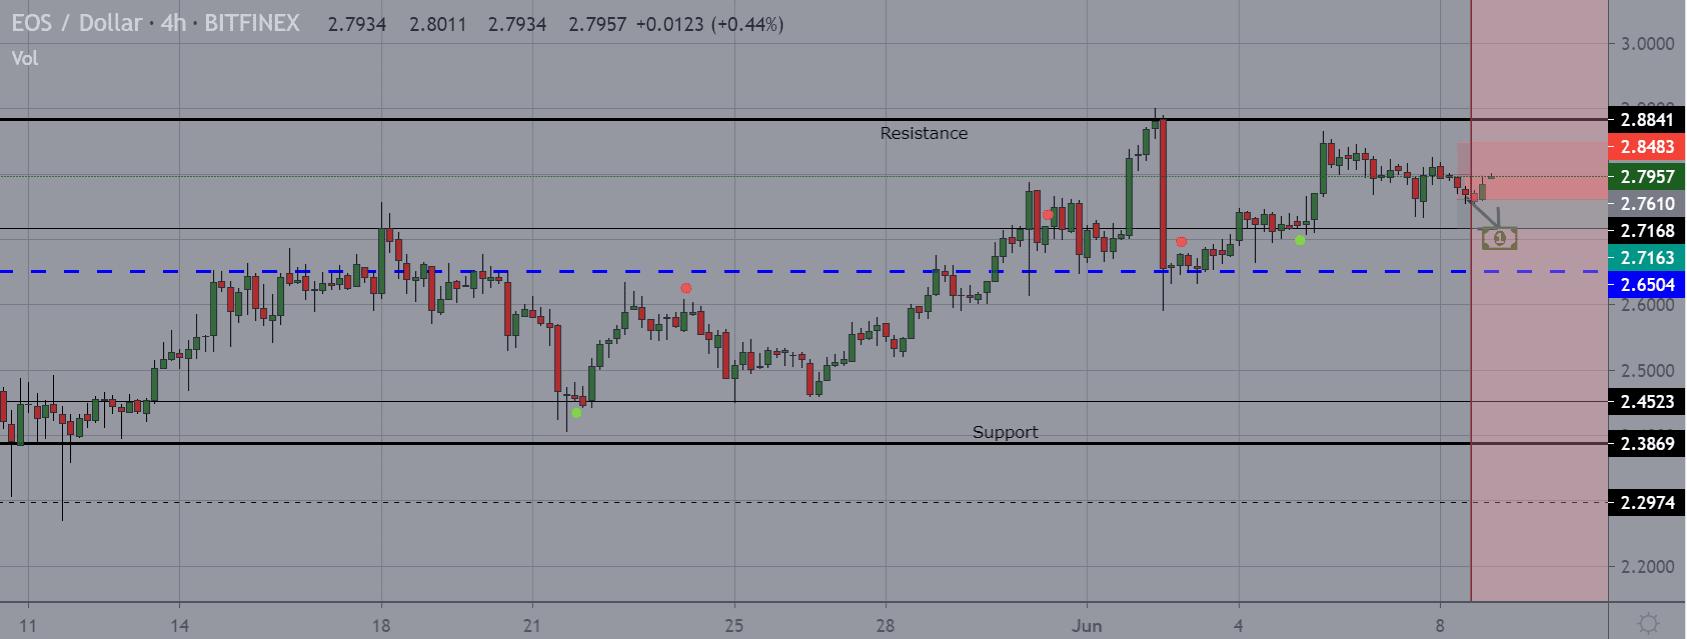 EOS price chart 2 - Jun8